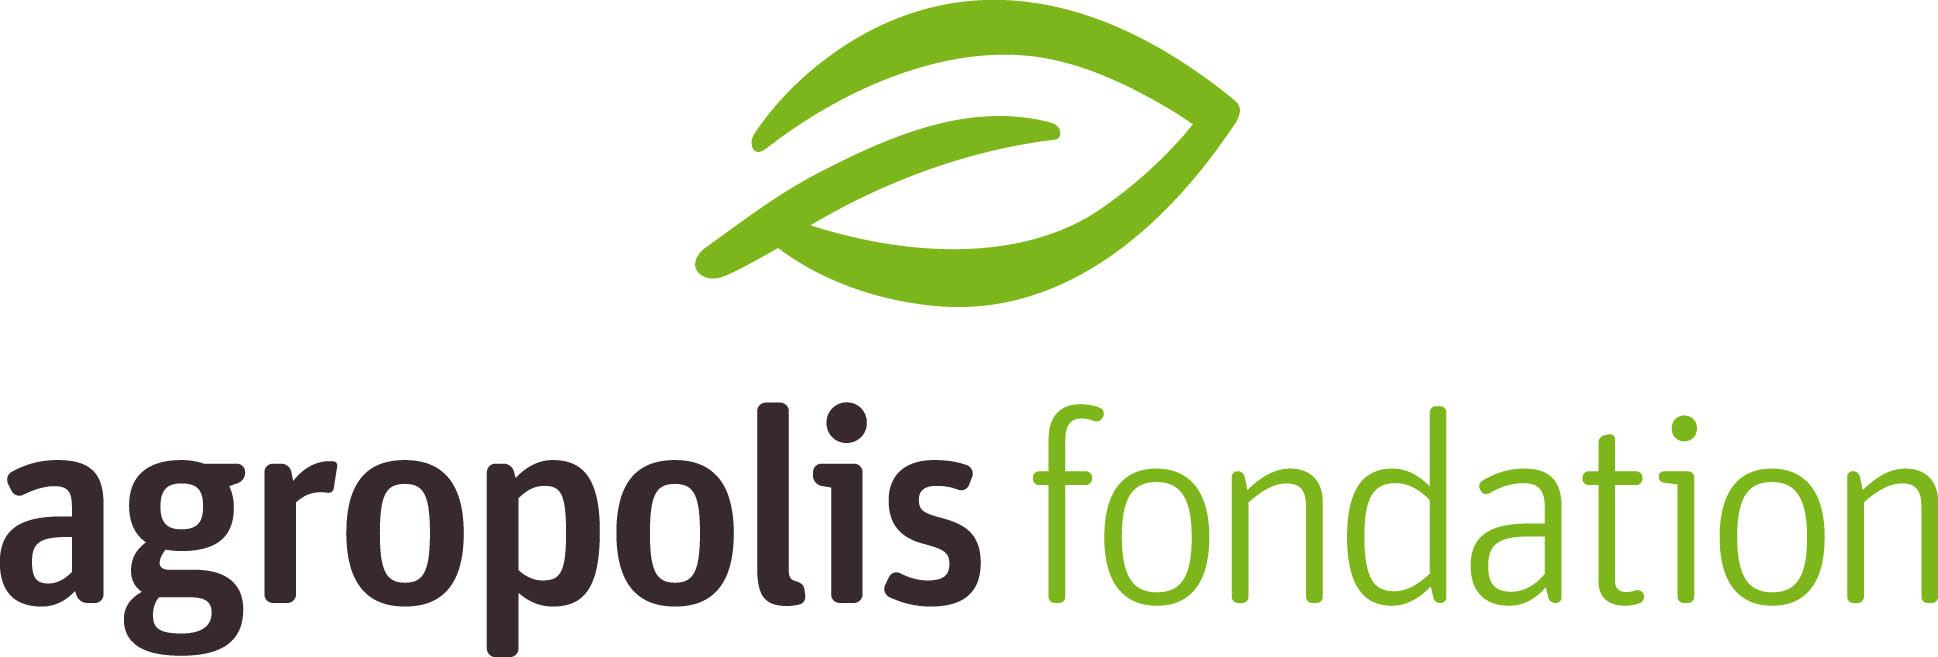 Agropolis Fondation Logo